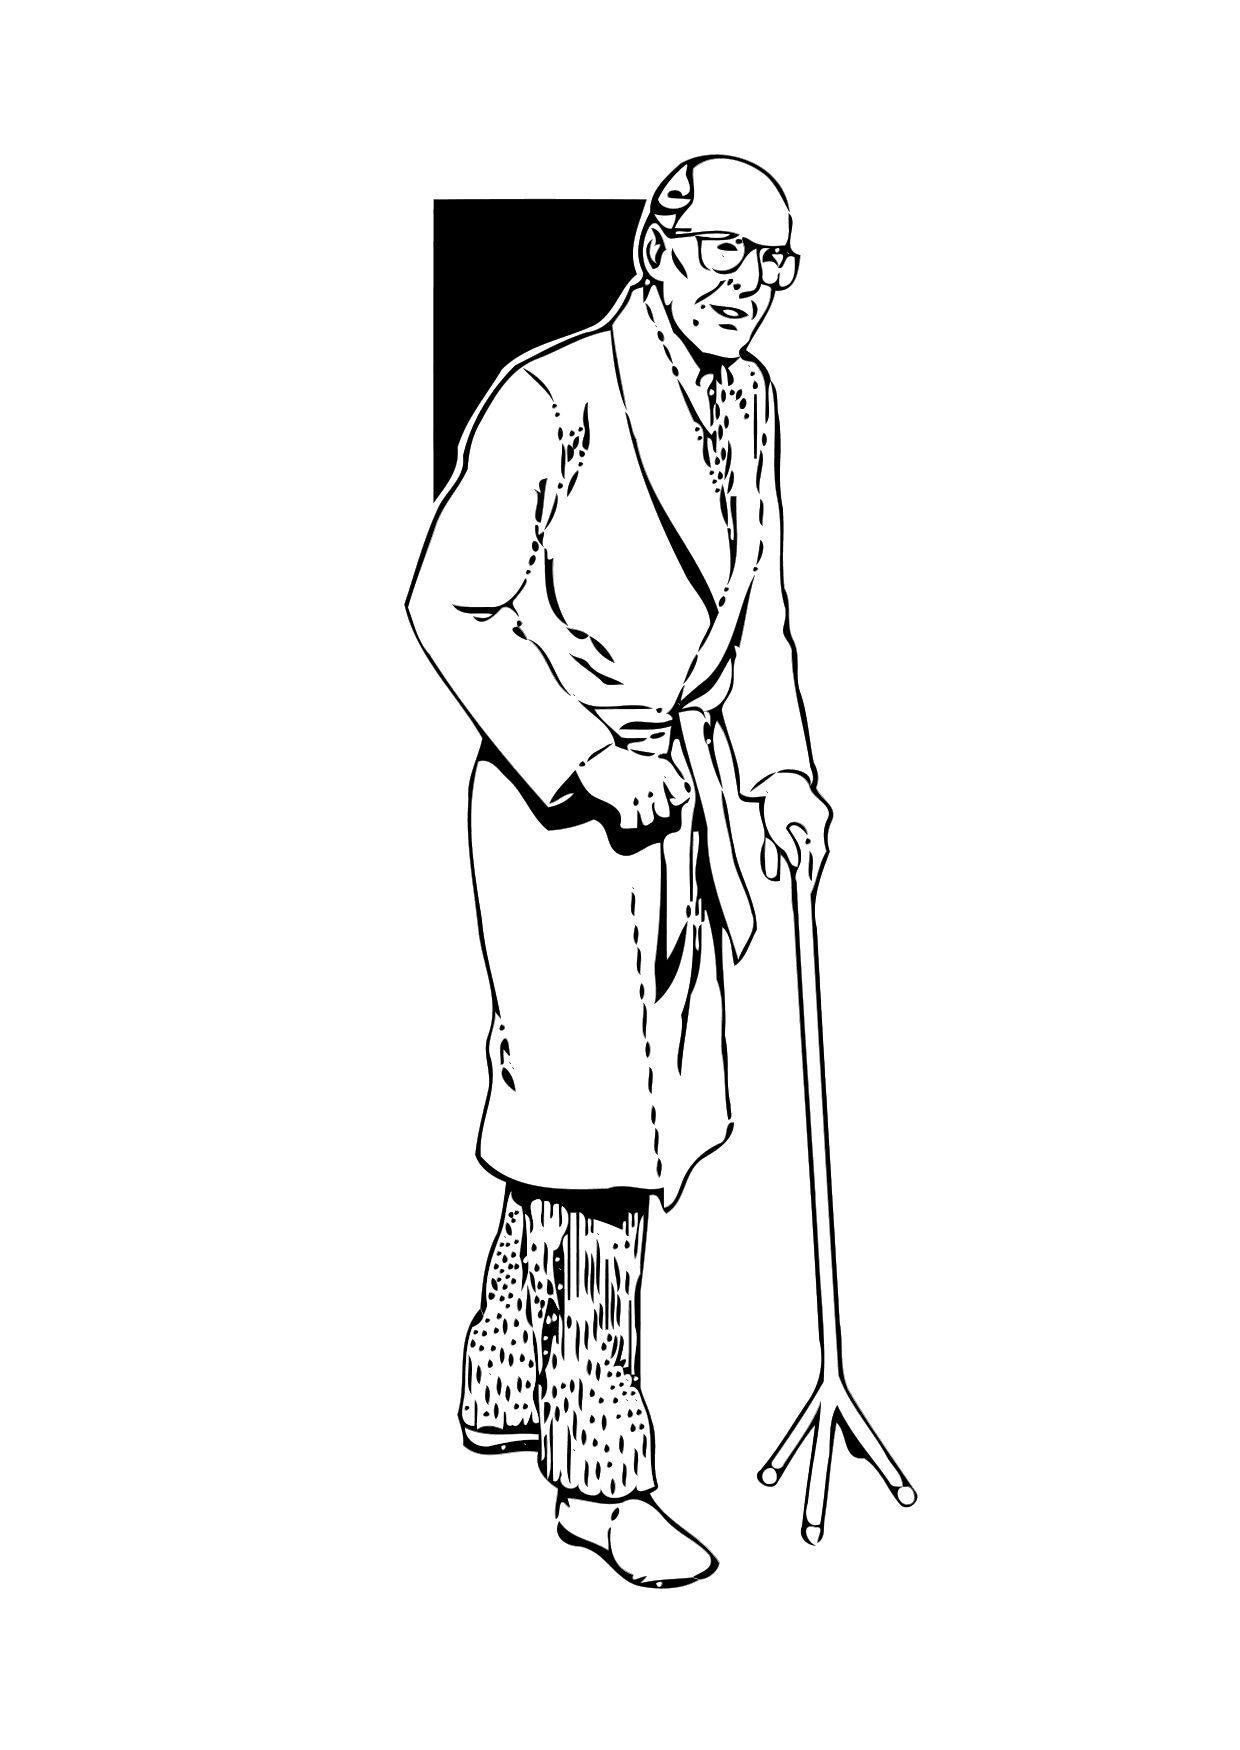 Dibujo para colorear Anciano - Img 11347